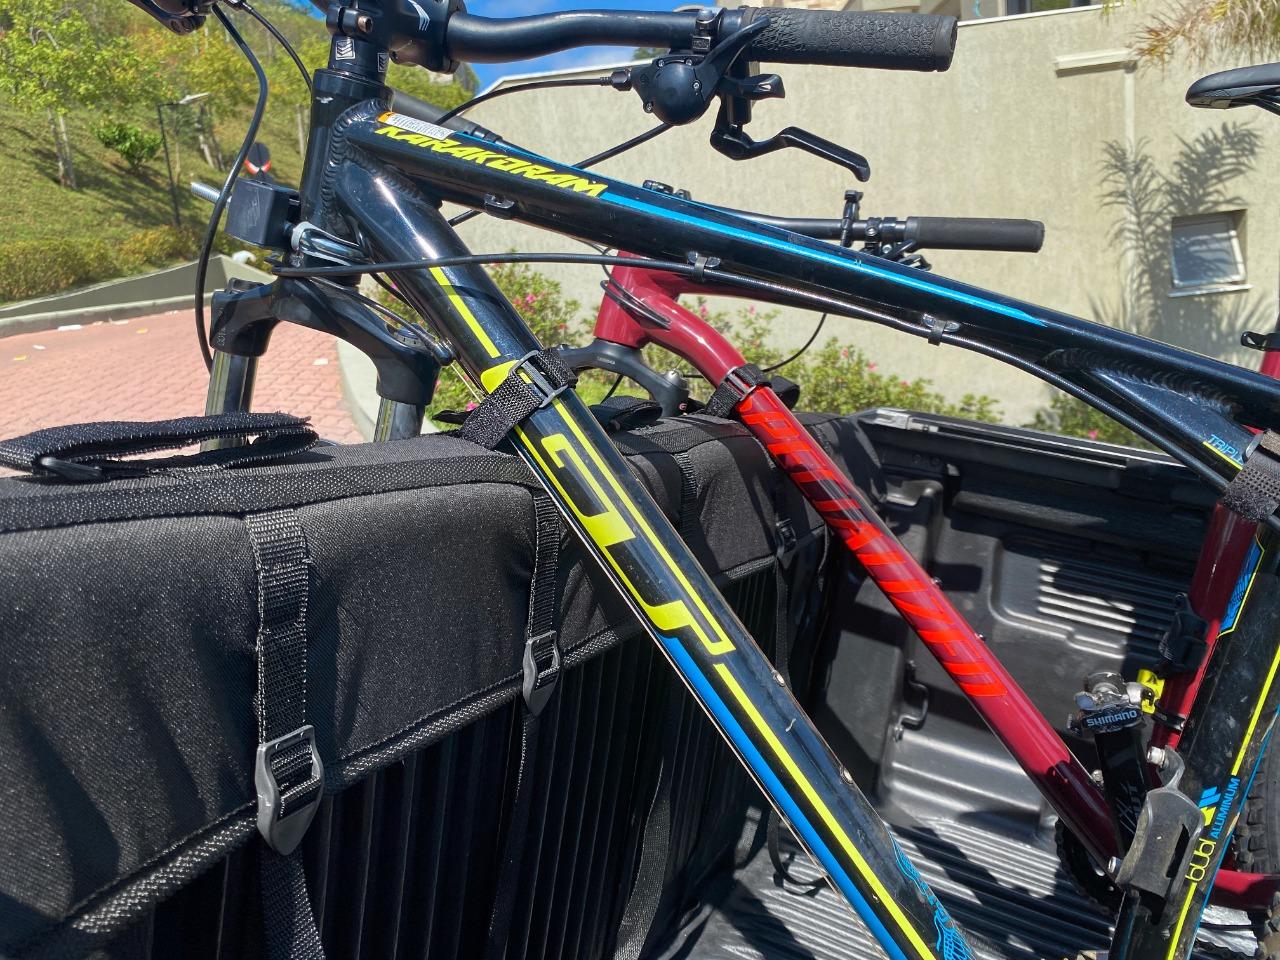 Transbike Truck Pad Truckpad Sterk Acessórios Volkswagen Vw Amarok Mitsubishi L200 Toyota Hilux Nissan Frontier Ford F150 F250 Ranger GM S10 Chevrolet Ram até 5 Bike Protetor de Tampa Traseira Preto transbike para caminhonete picape pick up bike bicicleta